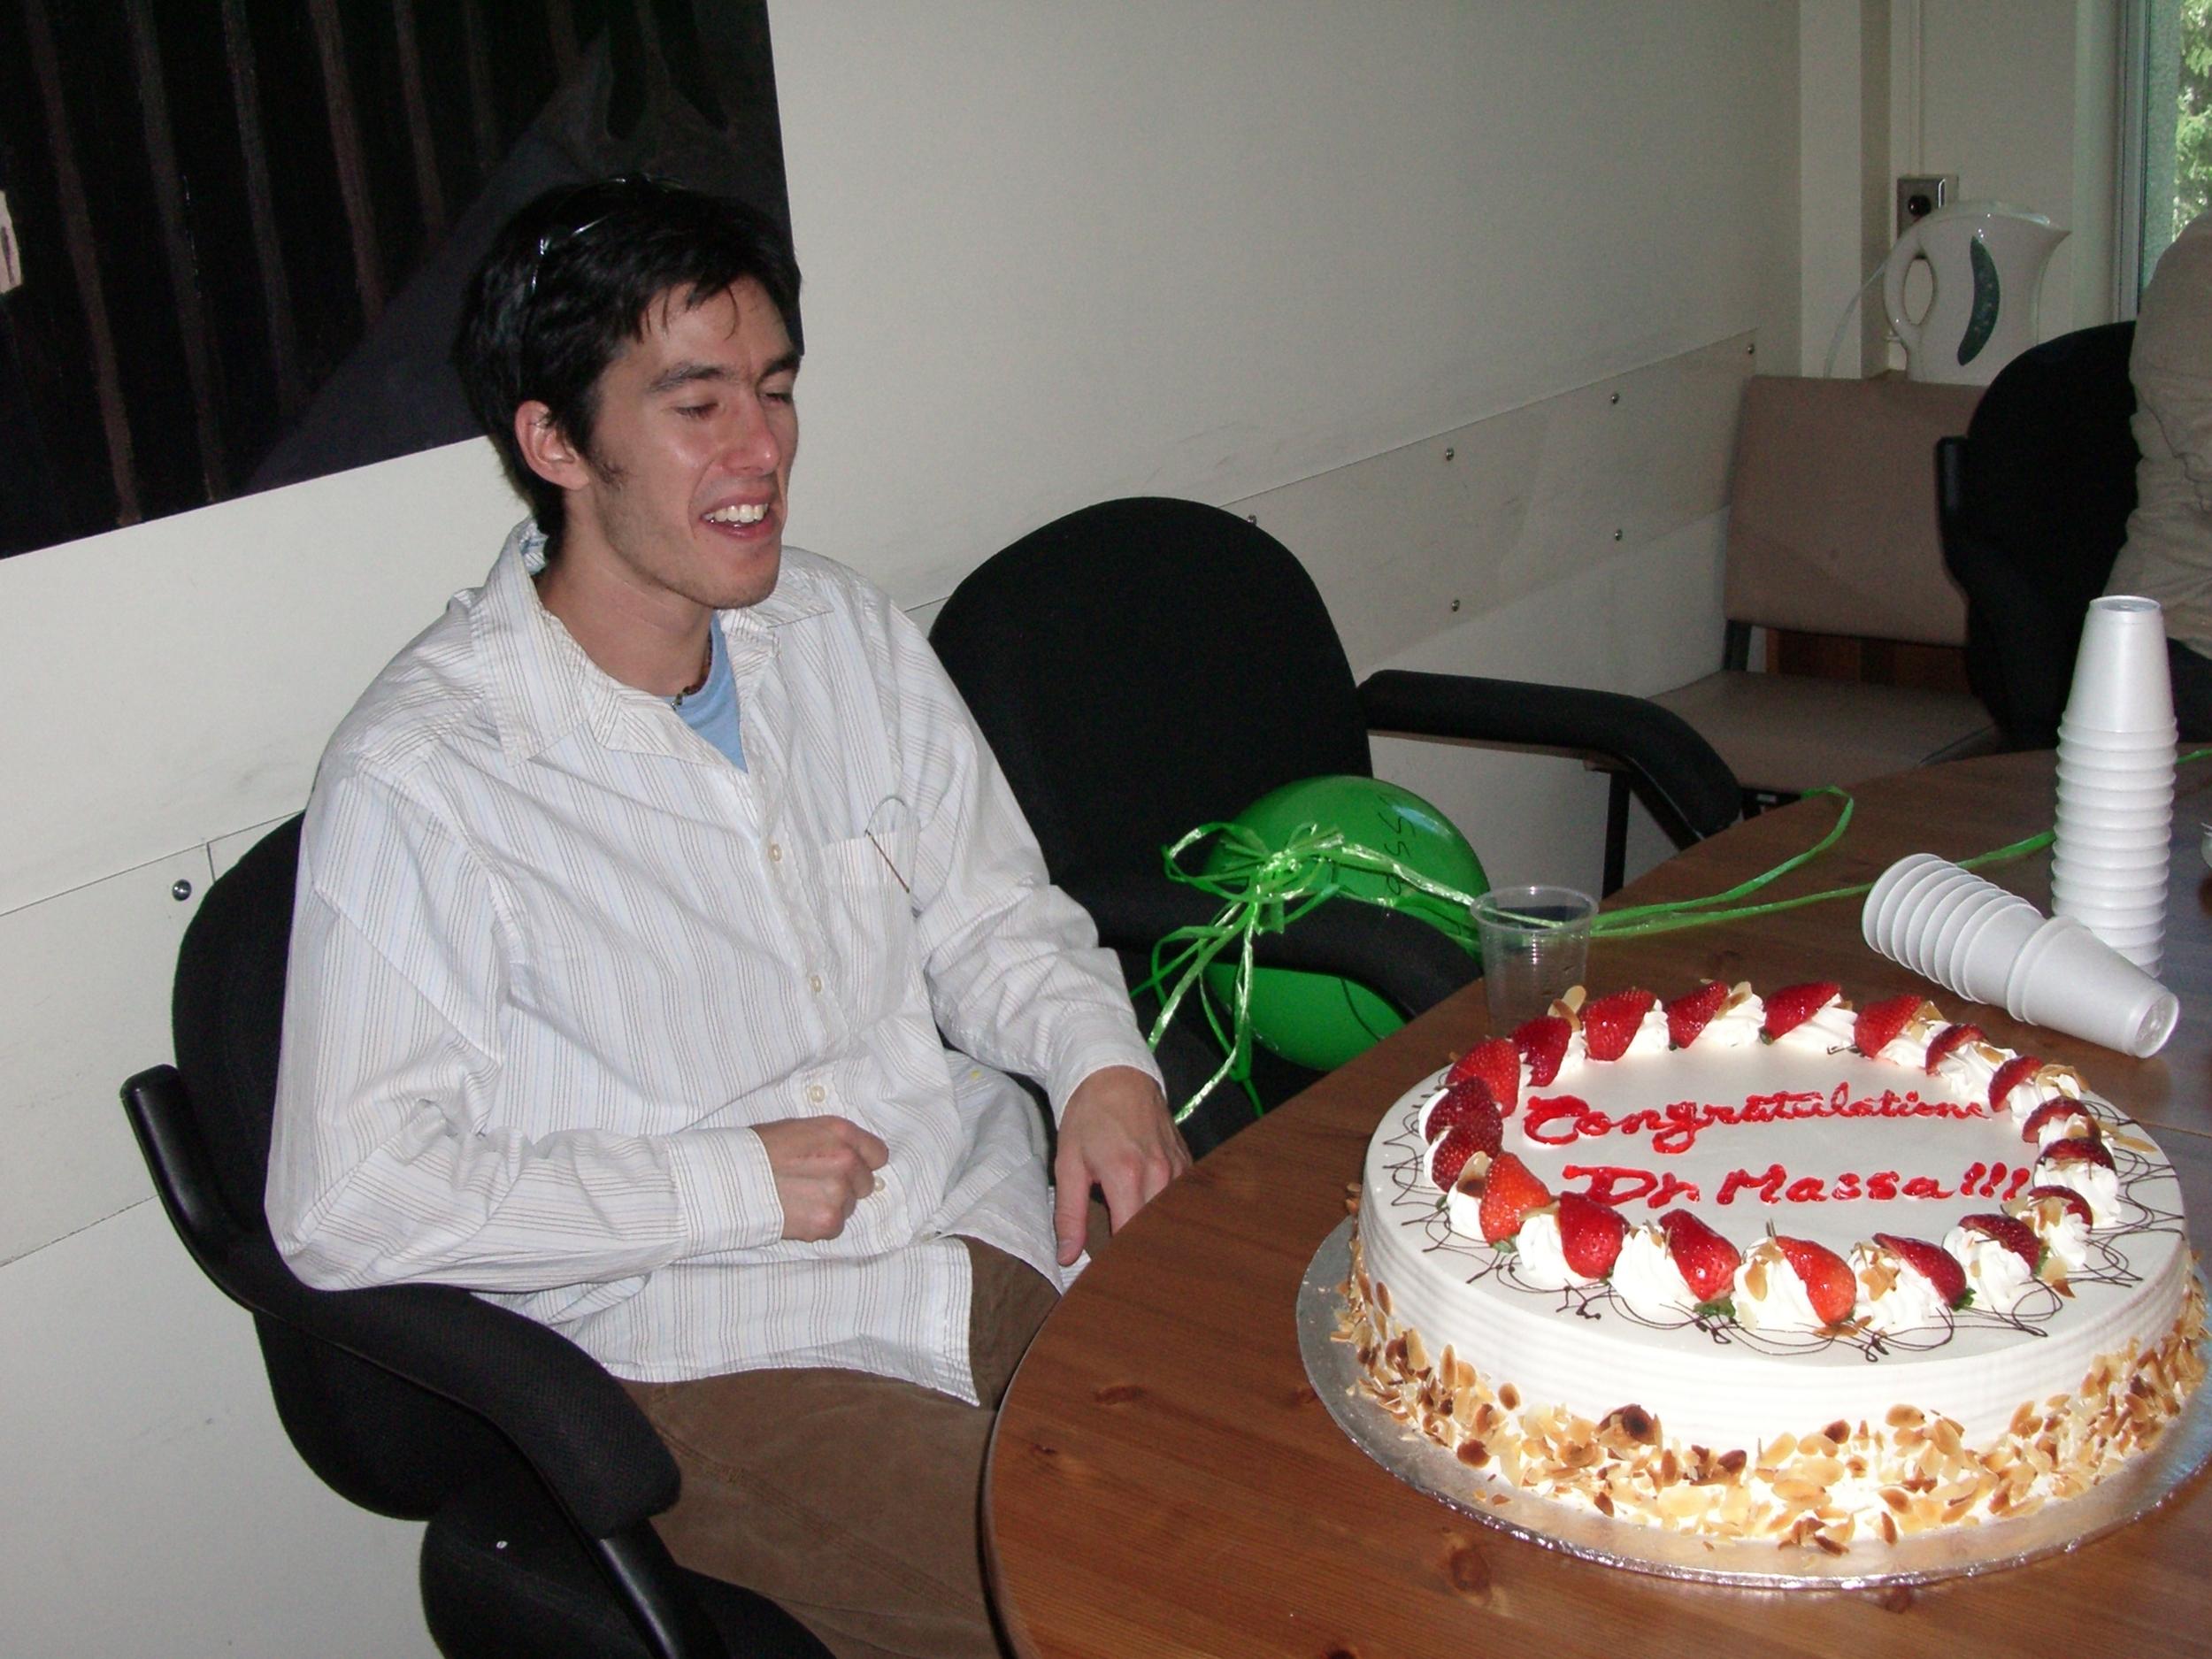 Dr. Massa! A bittersweet celebration